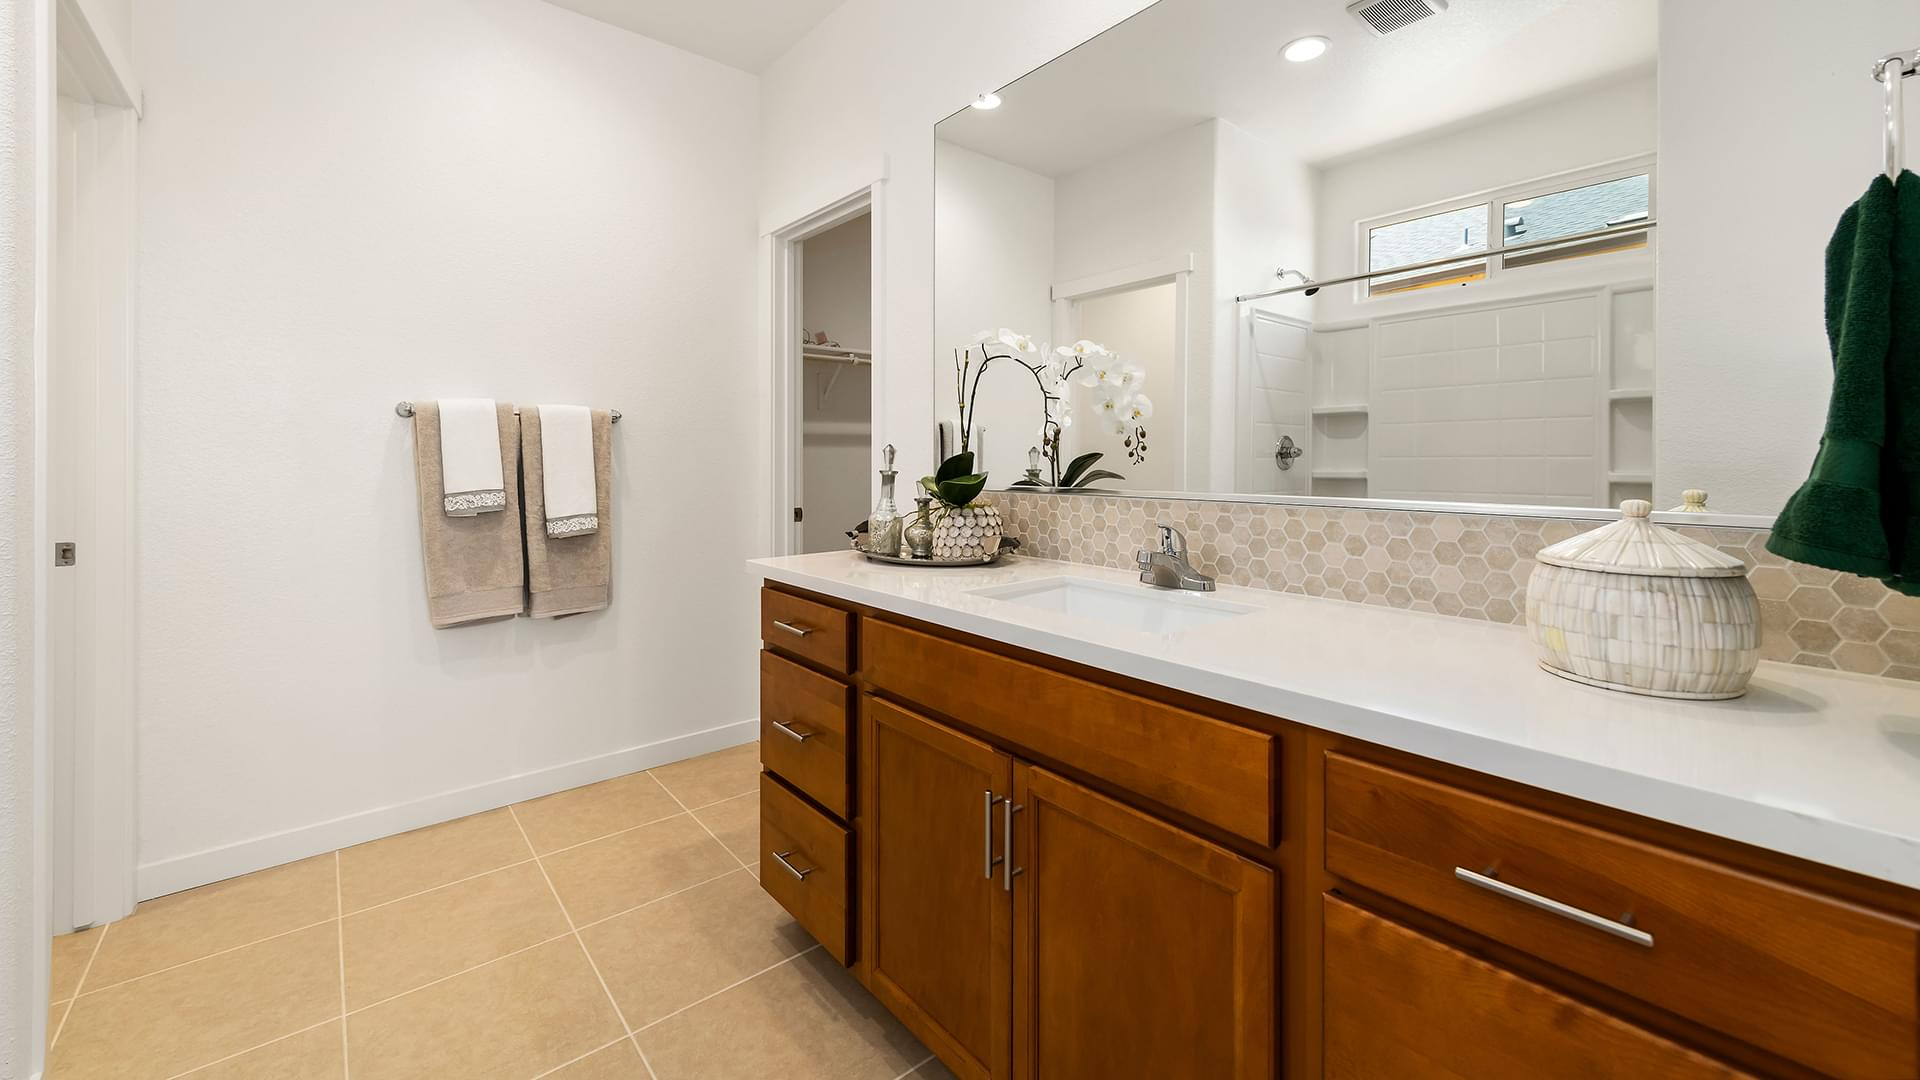 Residence 2A | Lot 167 | Master Bath